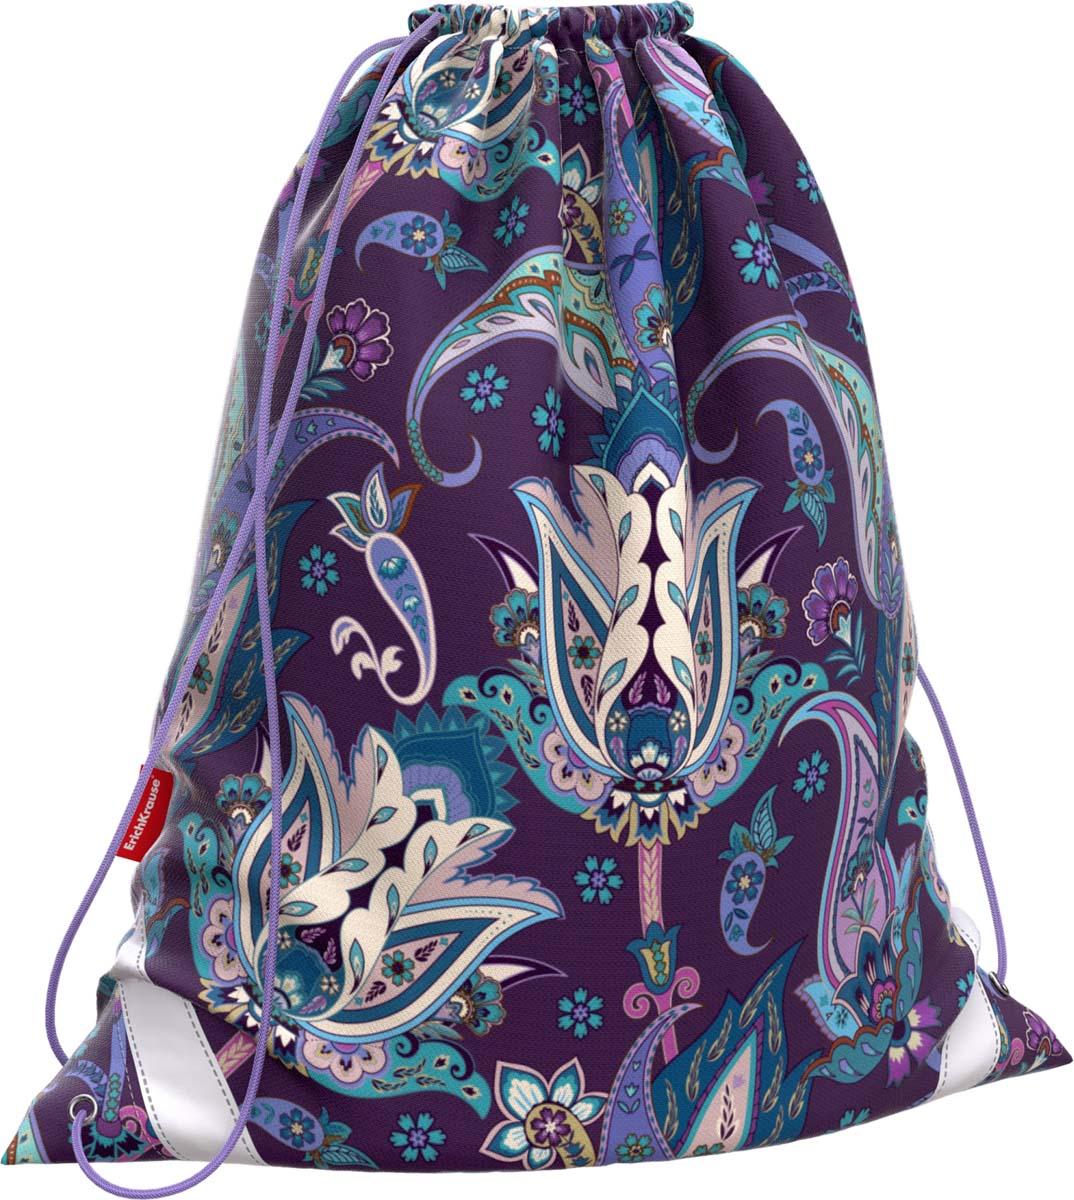 Erich Krause Сумка для сменной обуви Oriental Ornament 44749 - Ранцы и рюкзаки